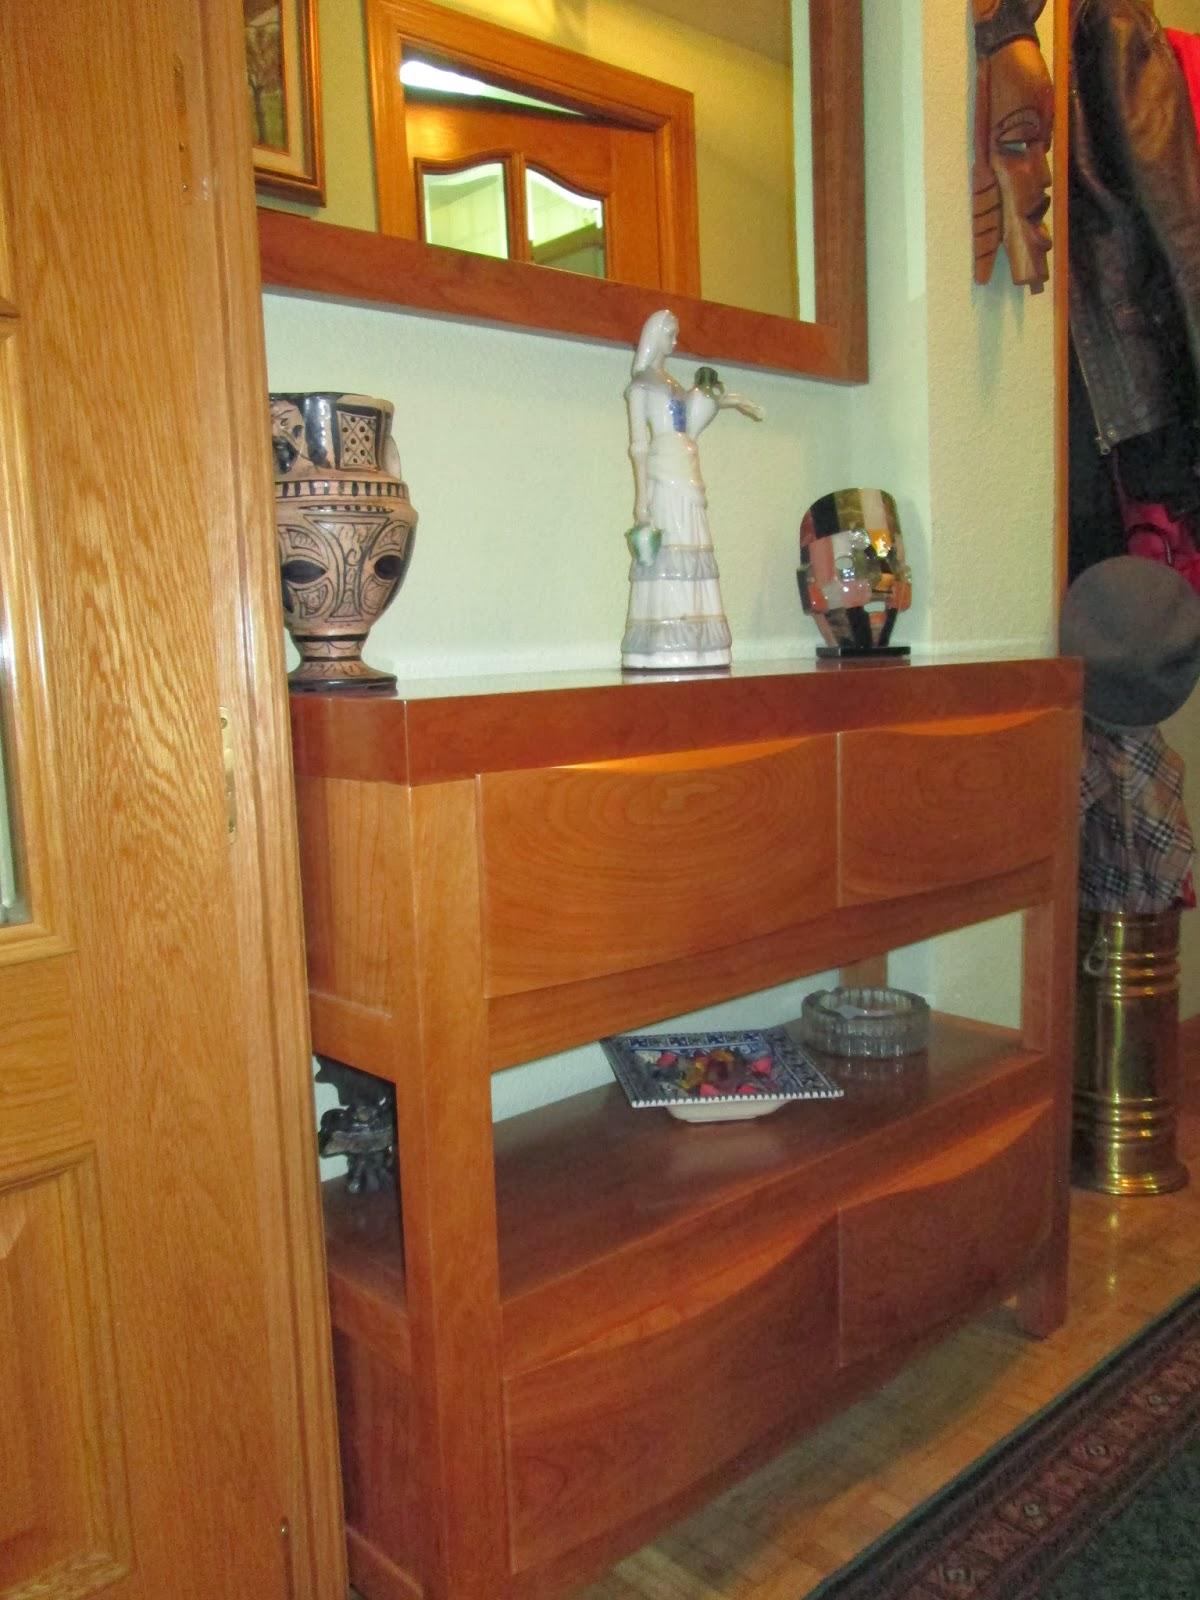 Carpinteria y ebanisteria alfageme aparadores recibidores y bureaus - Aparadores de entrada ...